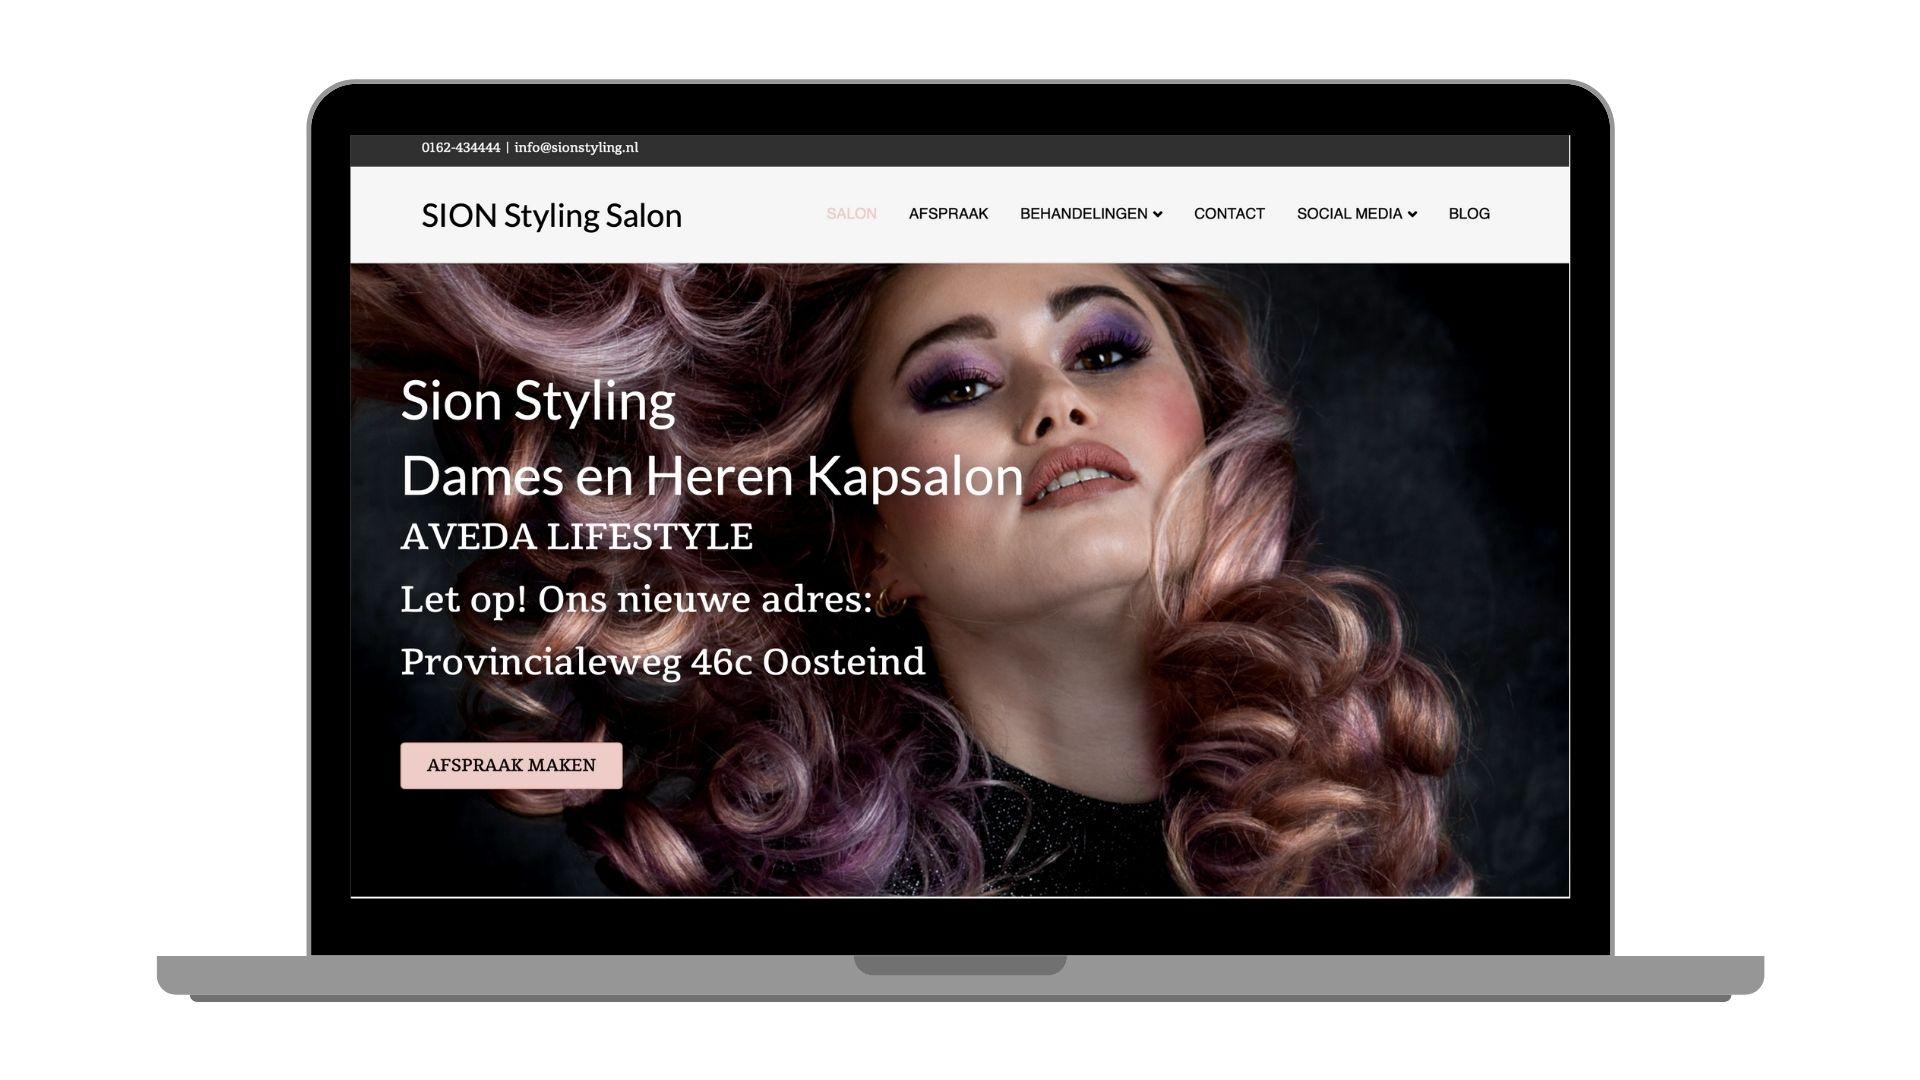 Aveda Kapsalon Sion Styling